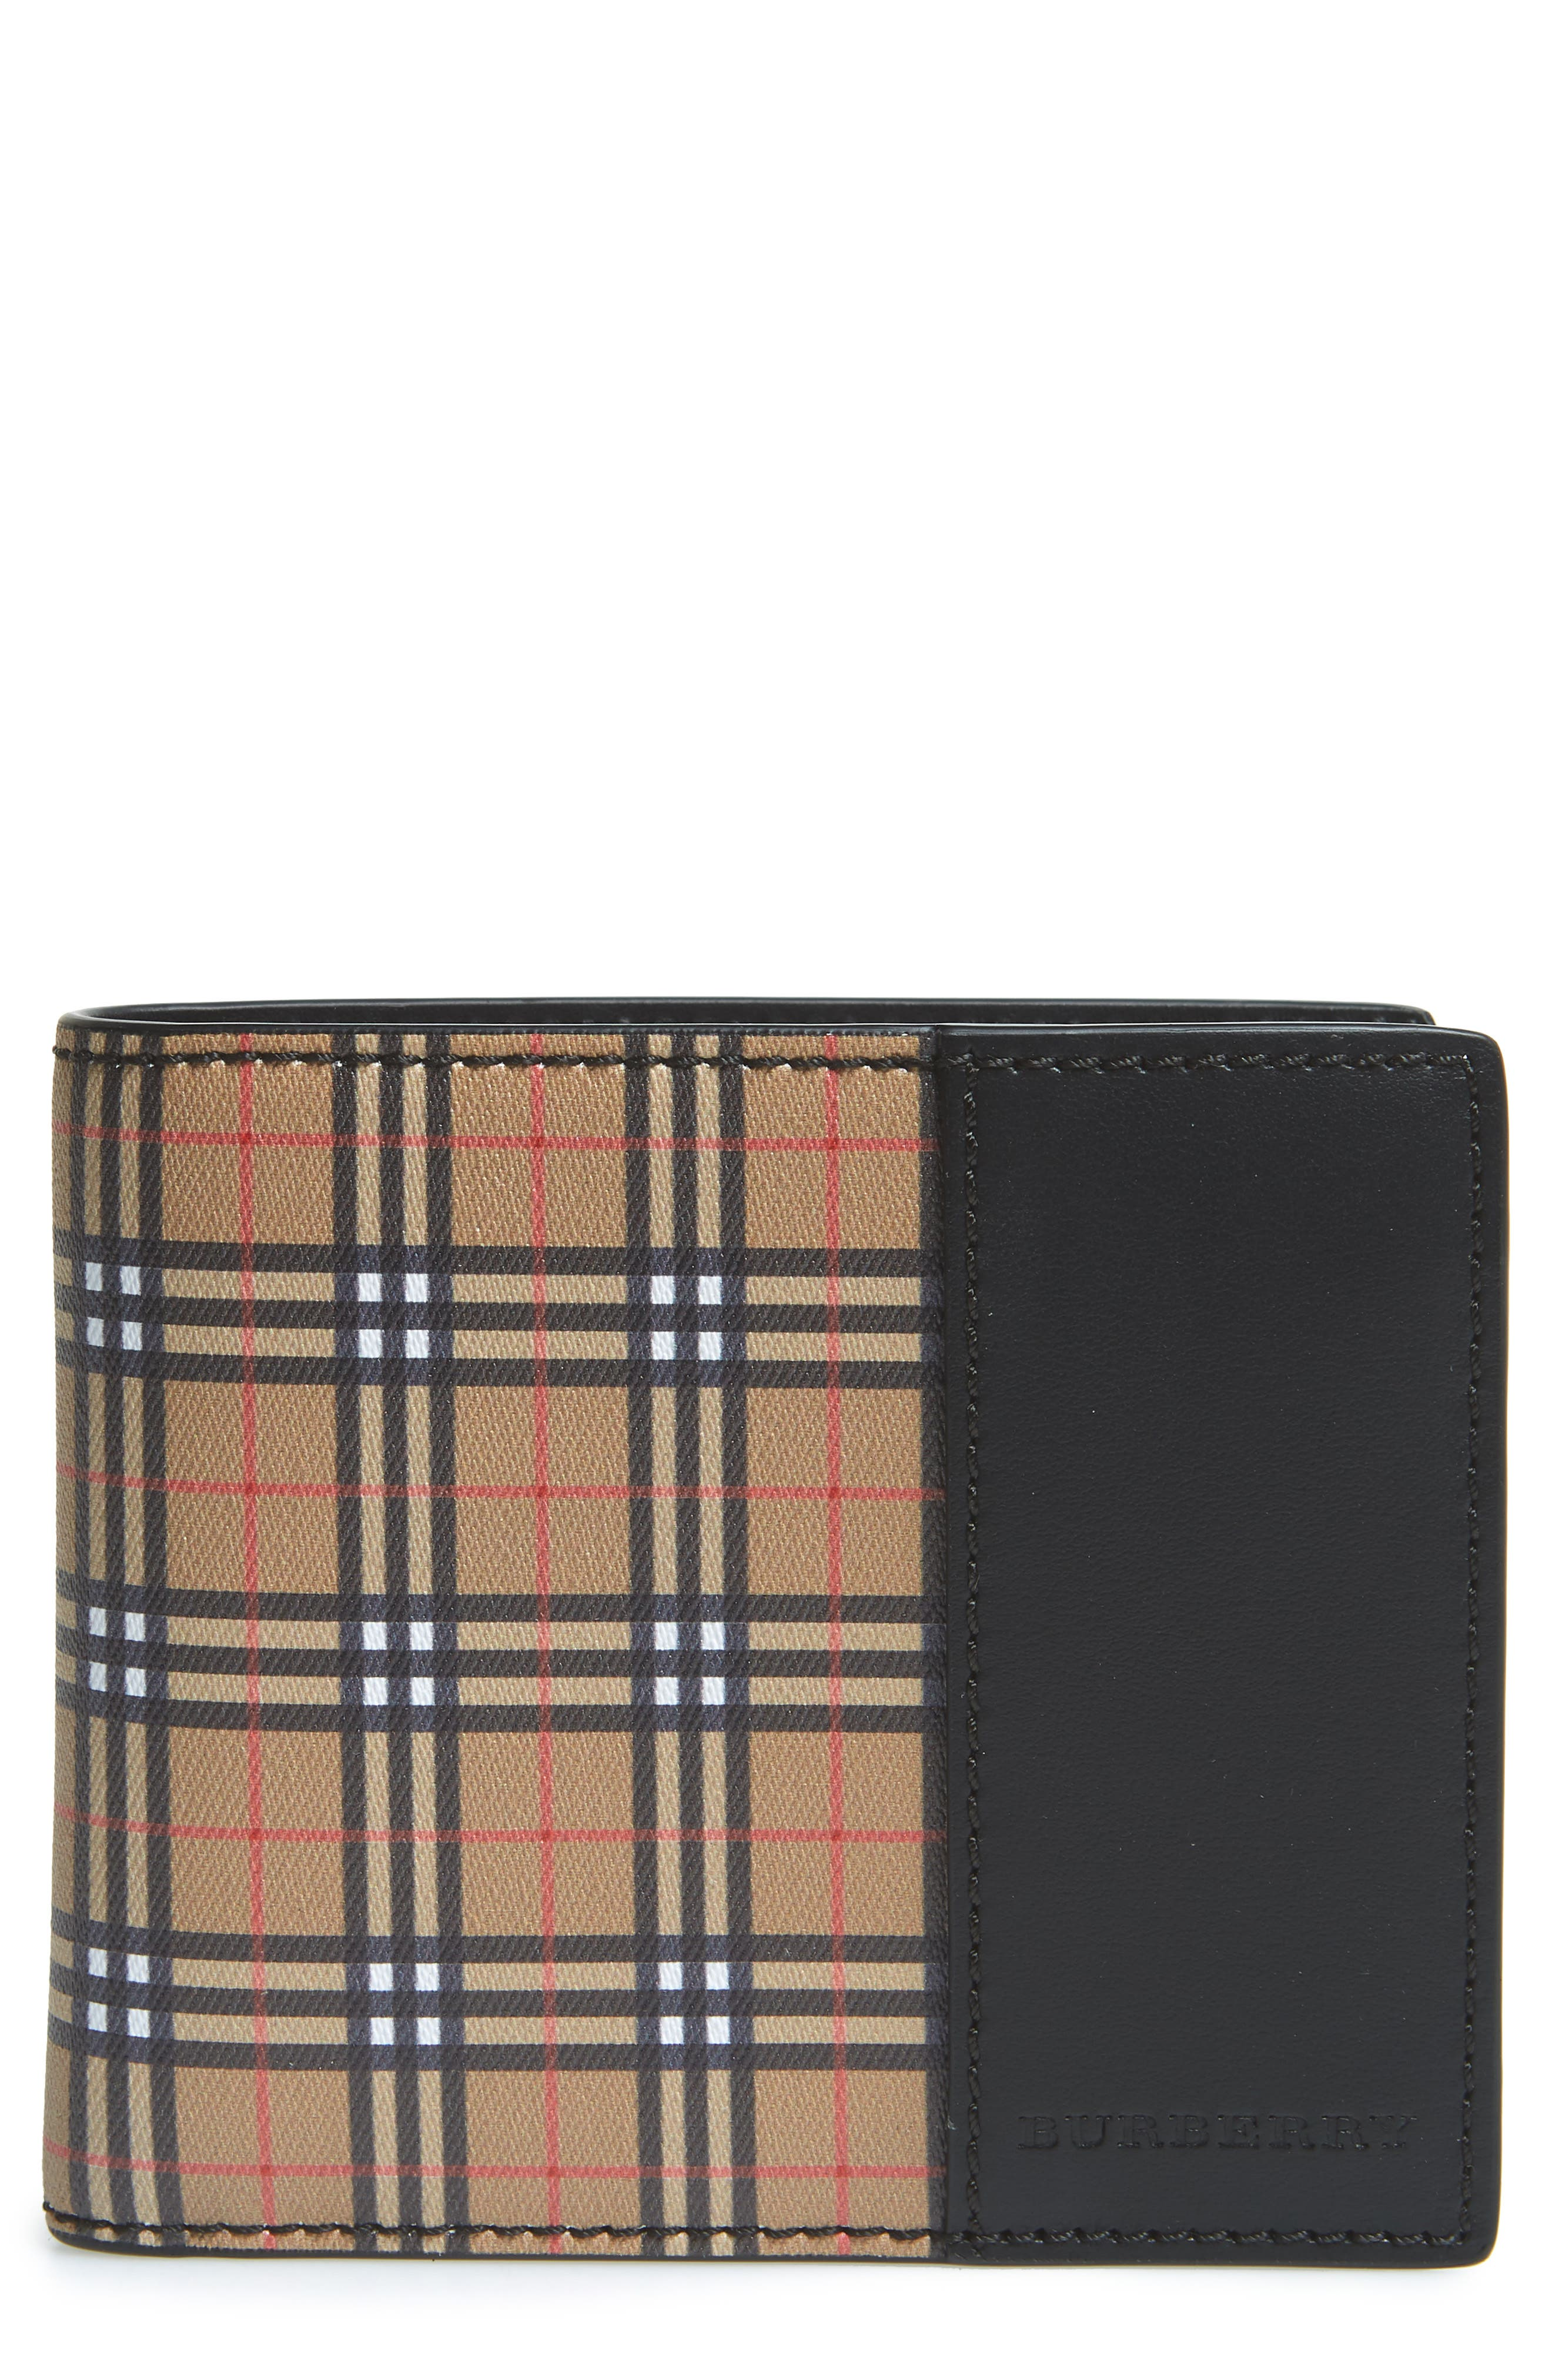 BURBERRY Wallet, Main, color, ANTIQUE YELLOW/ BLACK